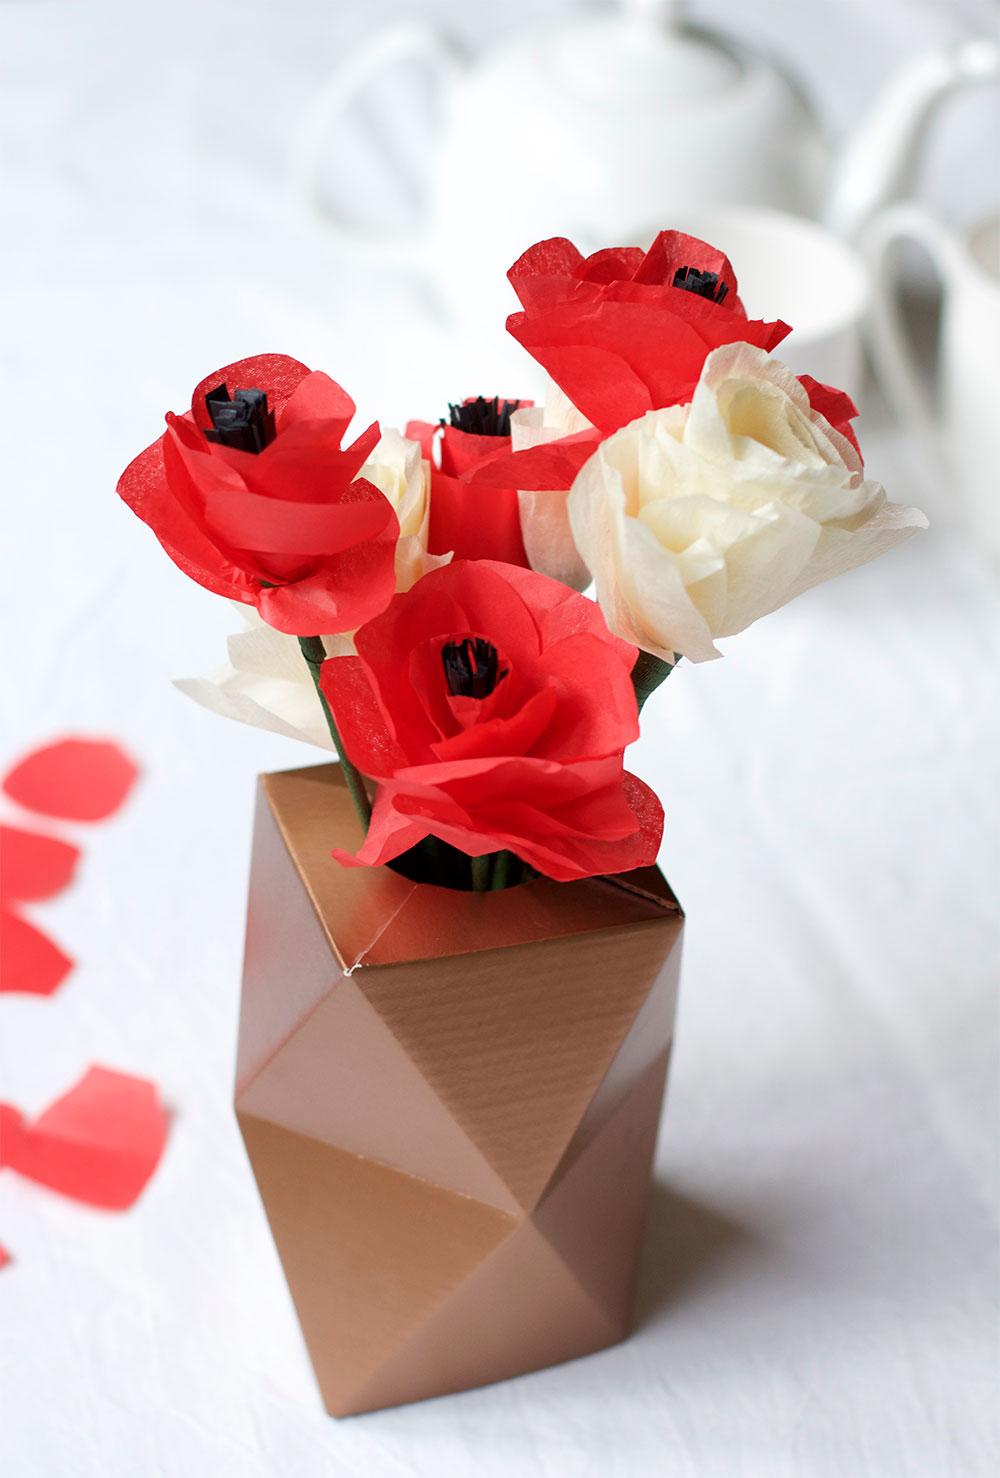 Diy Mohnblumen Aus Seidenpapier We Love Handmade In 2020 Seidenpapier Mohnblume Blumen